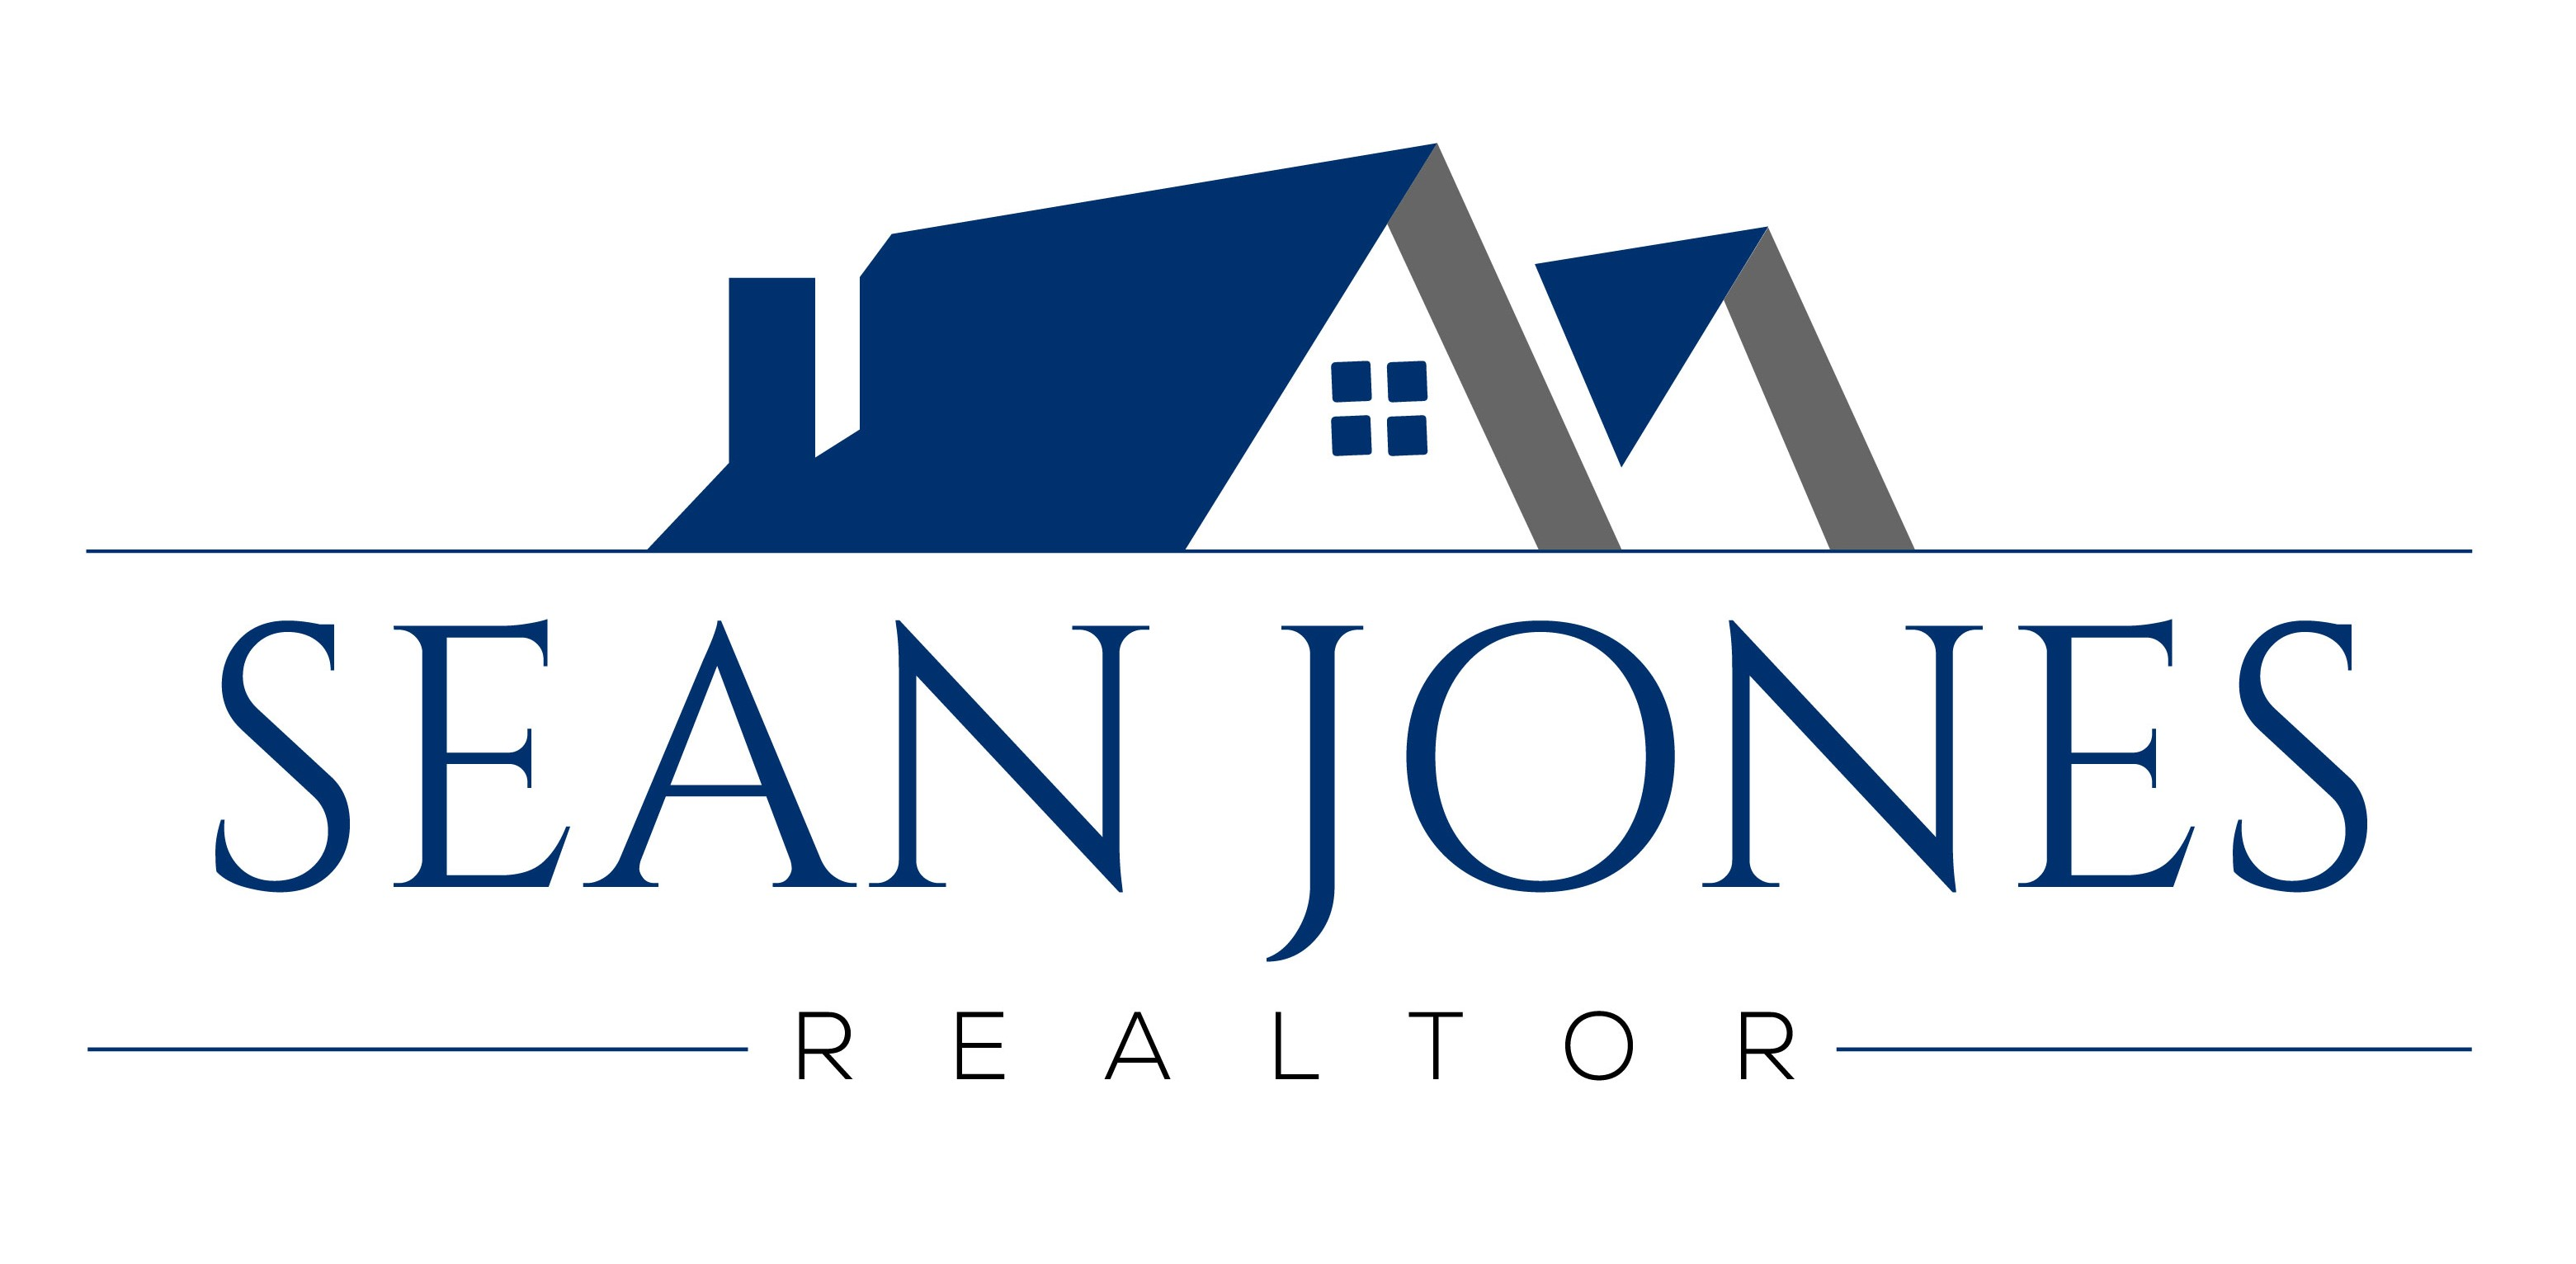 Sean Jones top Realtor in Locust Grove, VA 22508